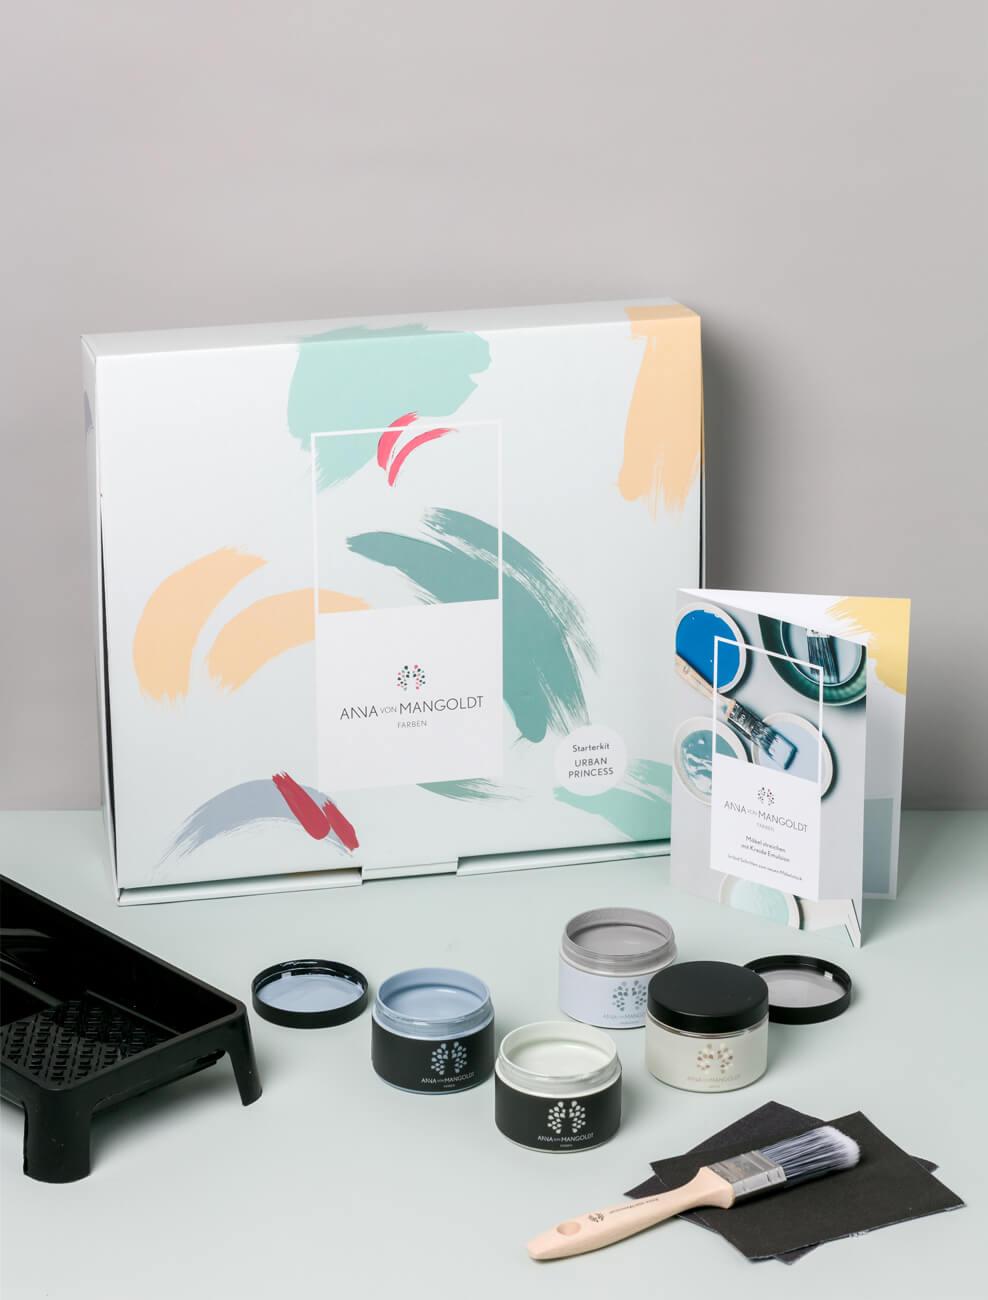 starter kit annas essentials miss pompadour. Black Bedroom Furniture Sets. Home Design Ideas